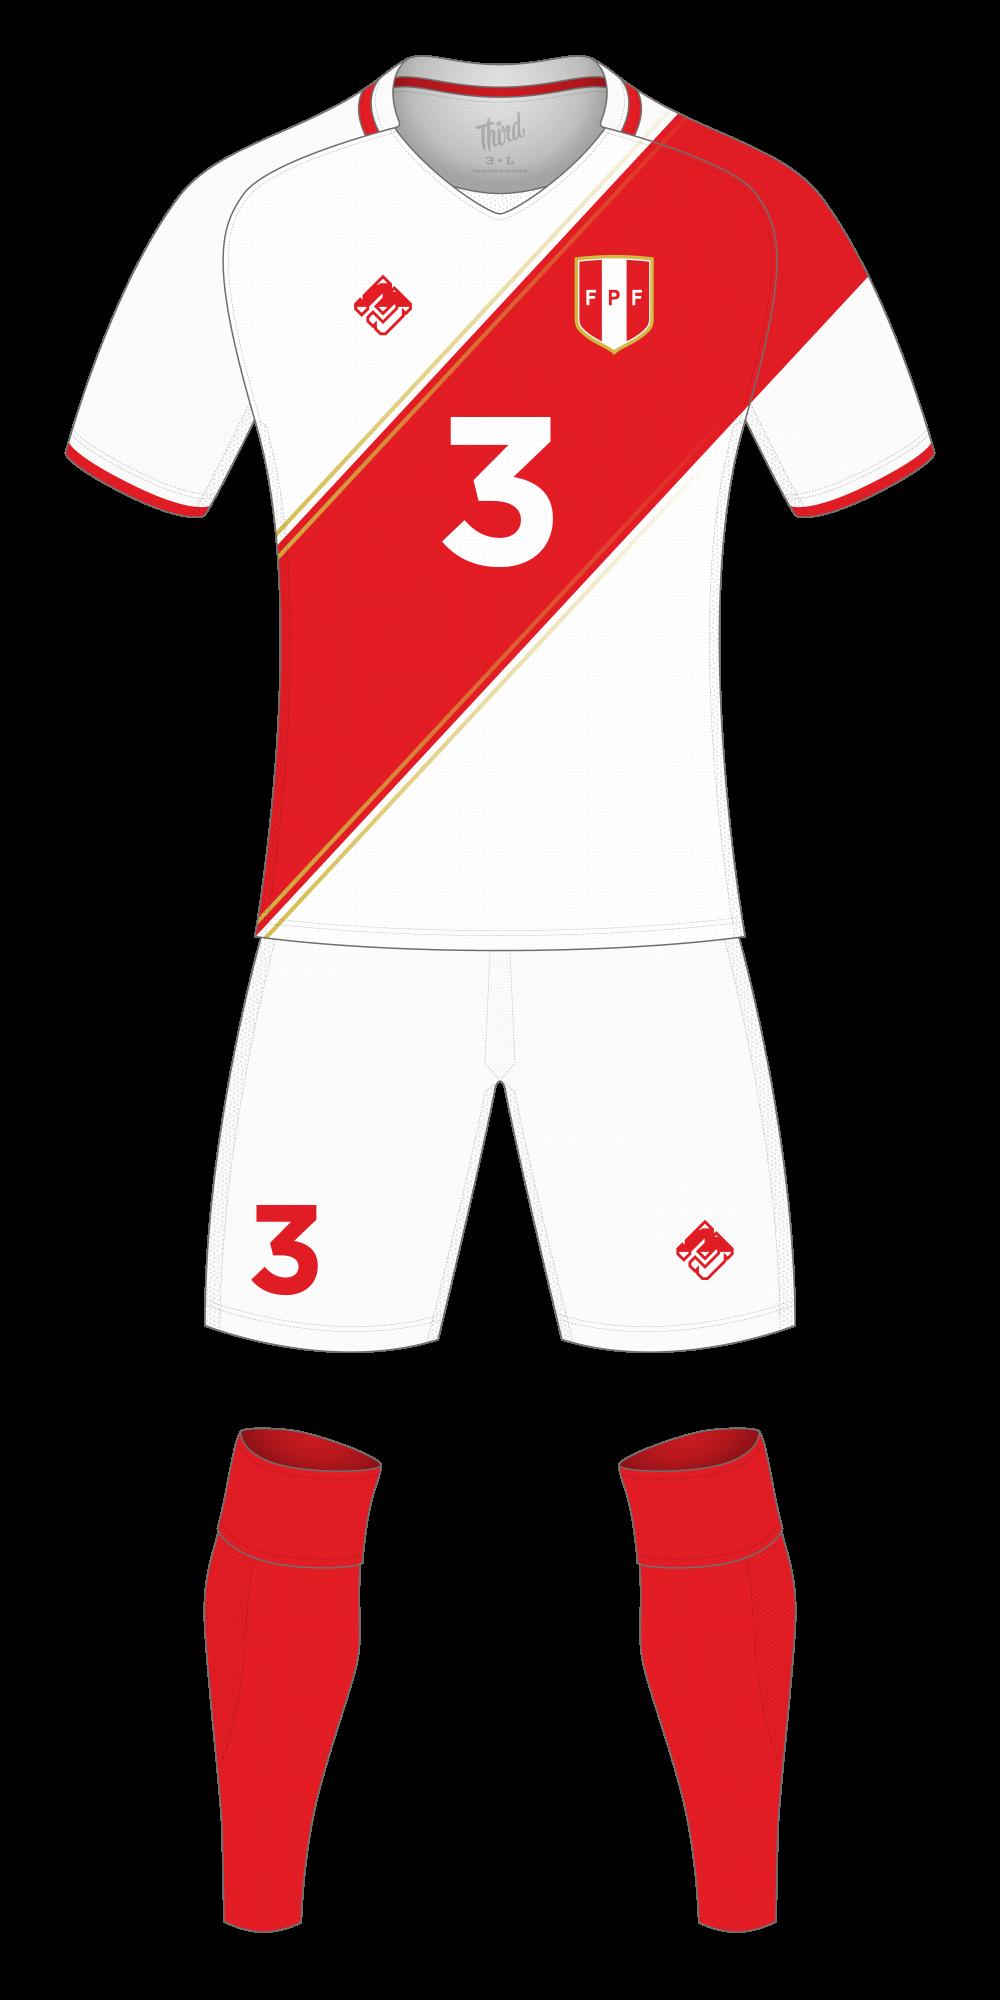 Peru World Cup 2018 concept